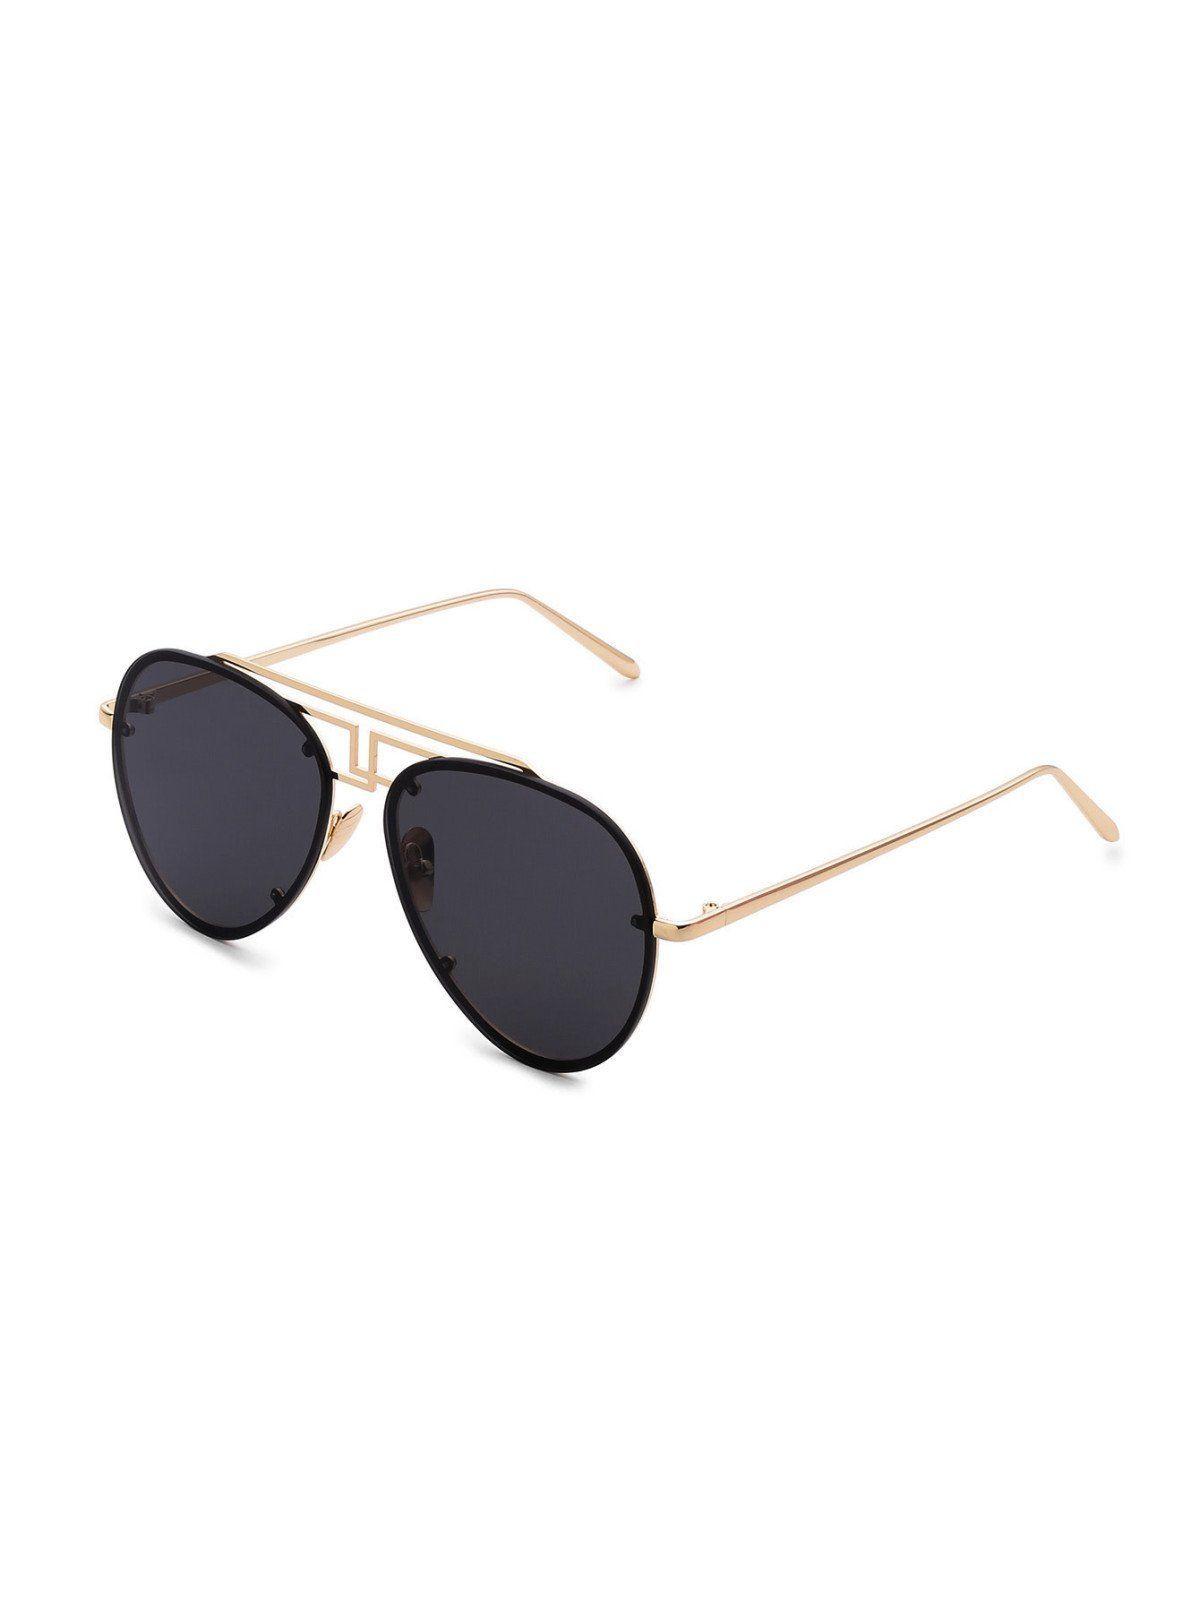 526d0ed2c5 Asymmetrical Top Bar Rimless Aviator Sunglasses